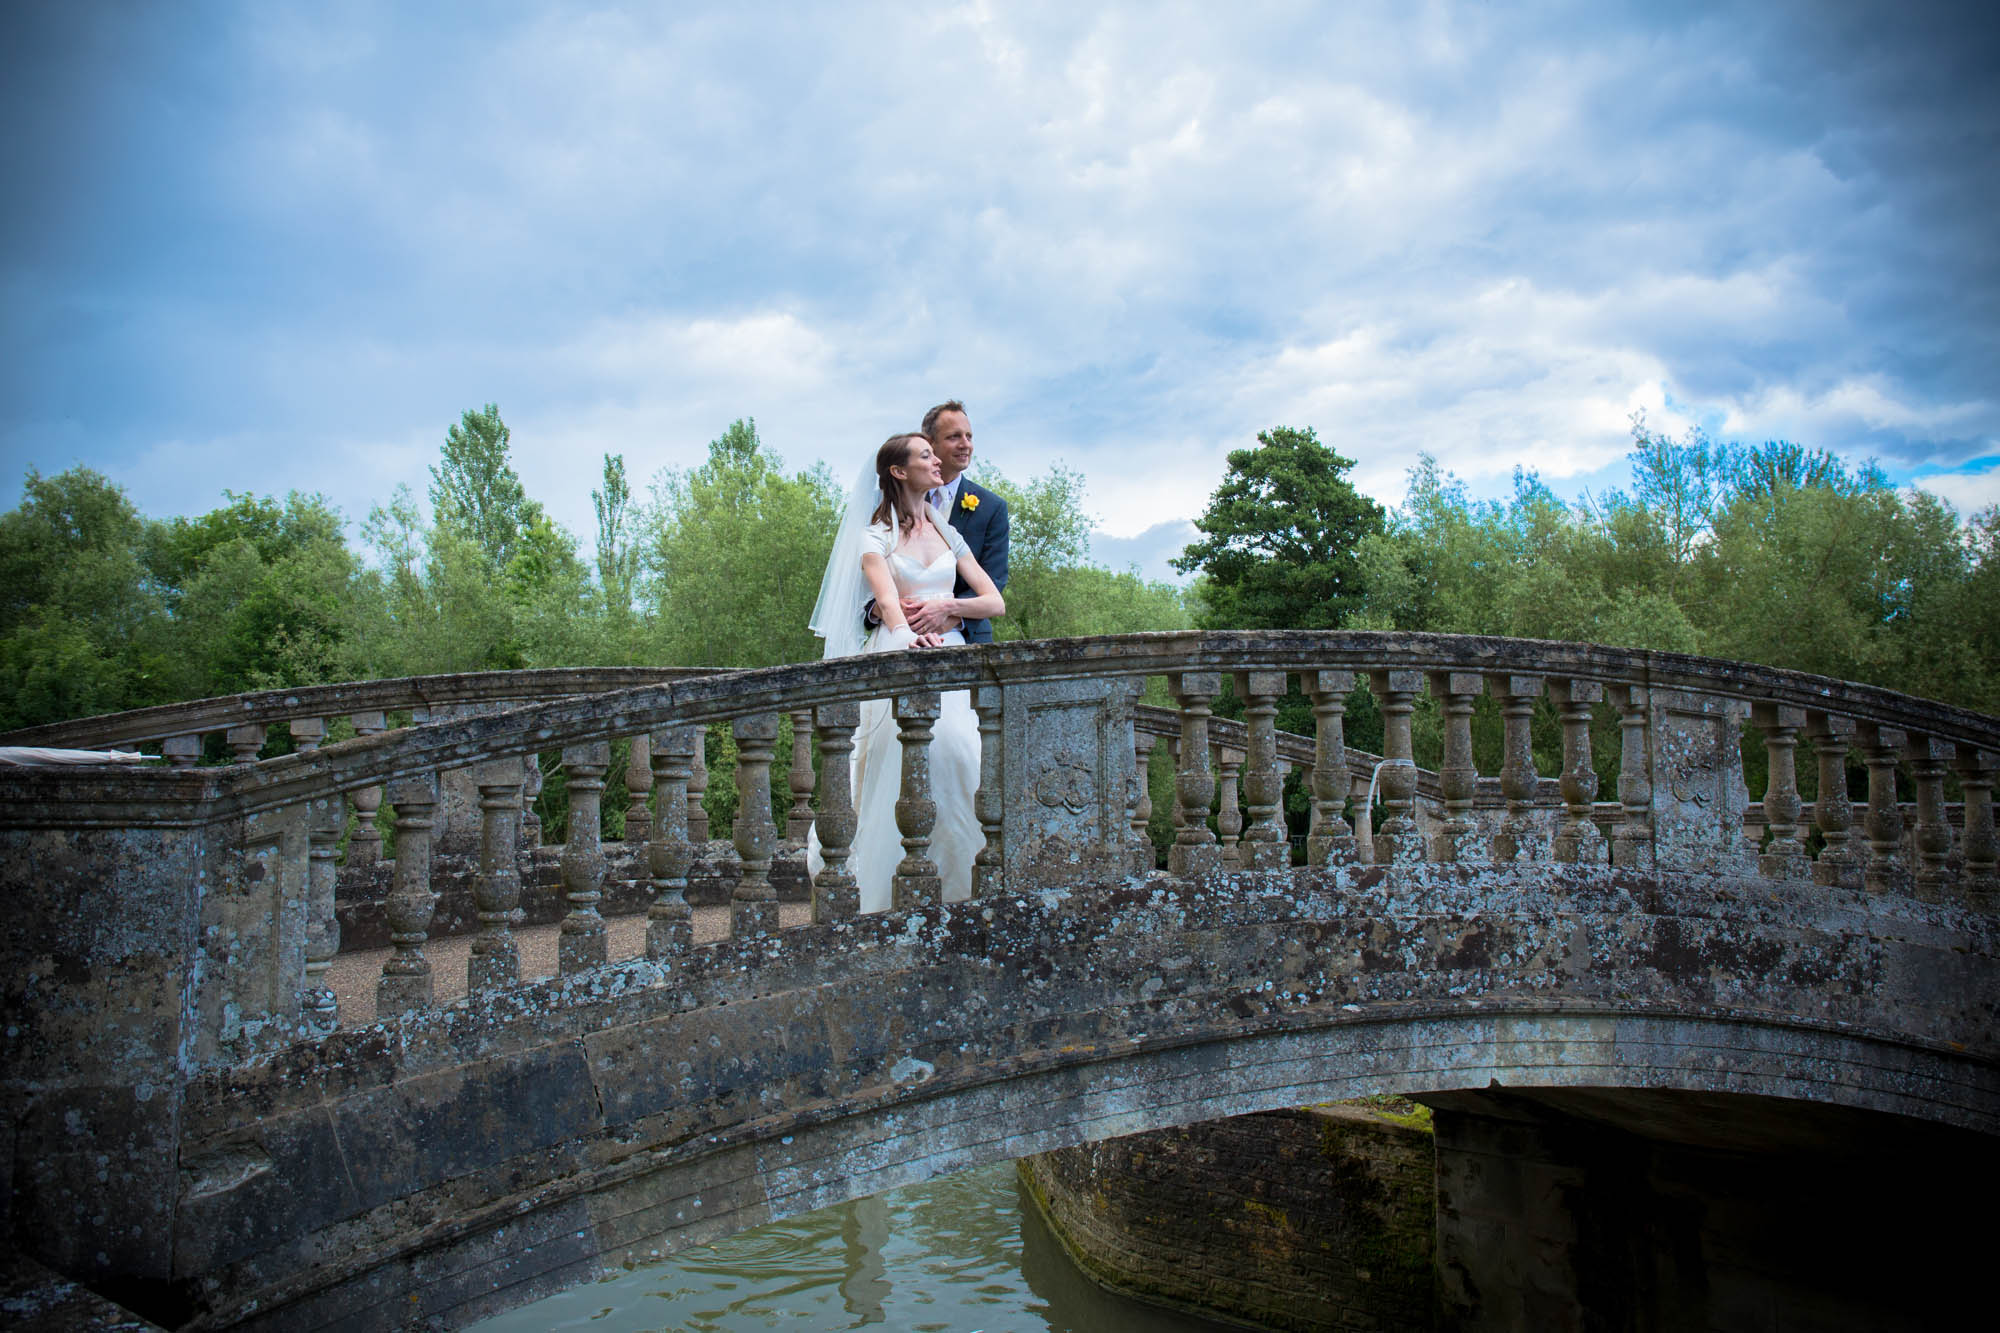 weddings-couples-love-photographer-oxford-london-jonathan-self-photography-78.jpg